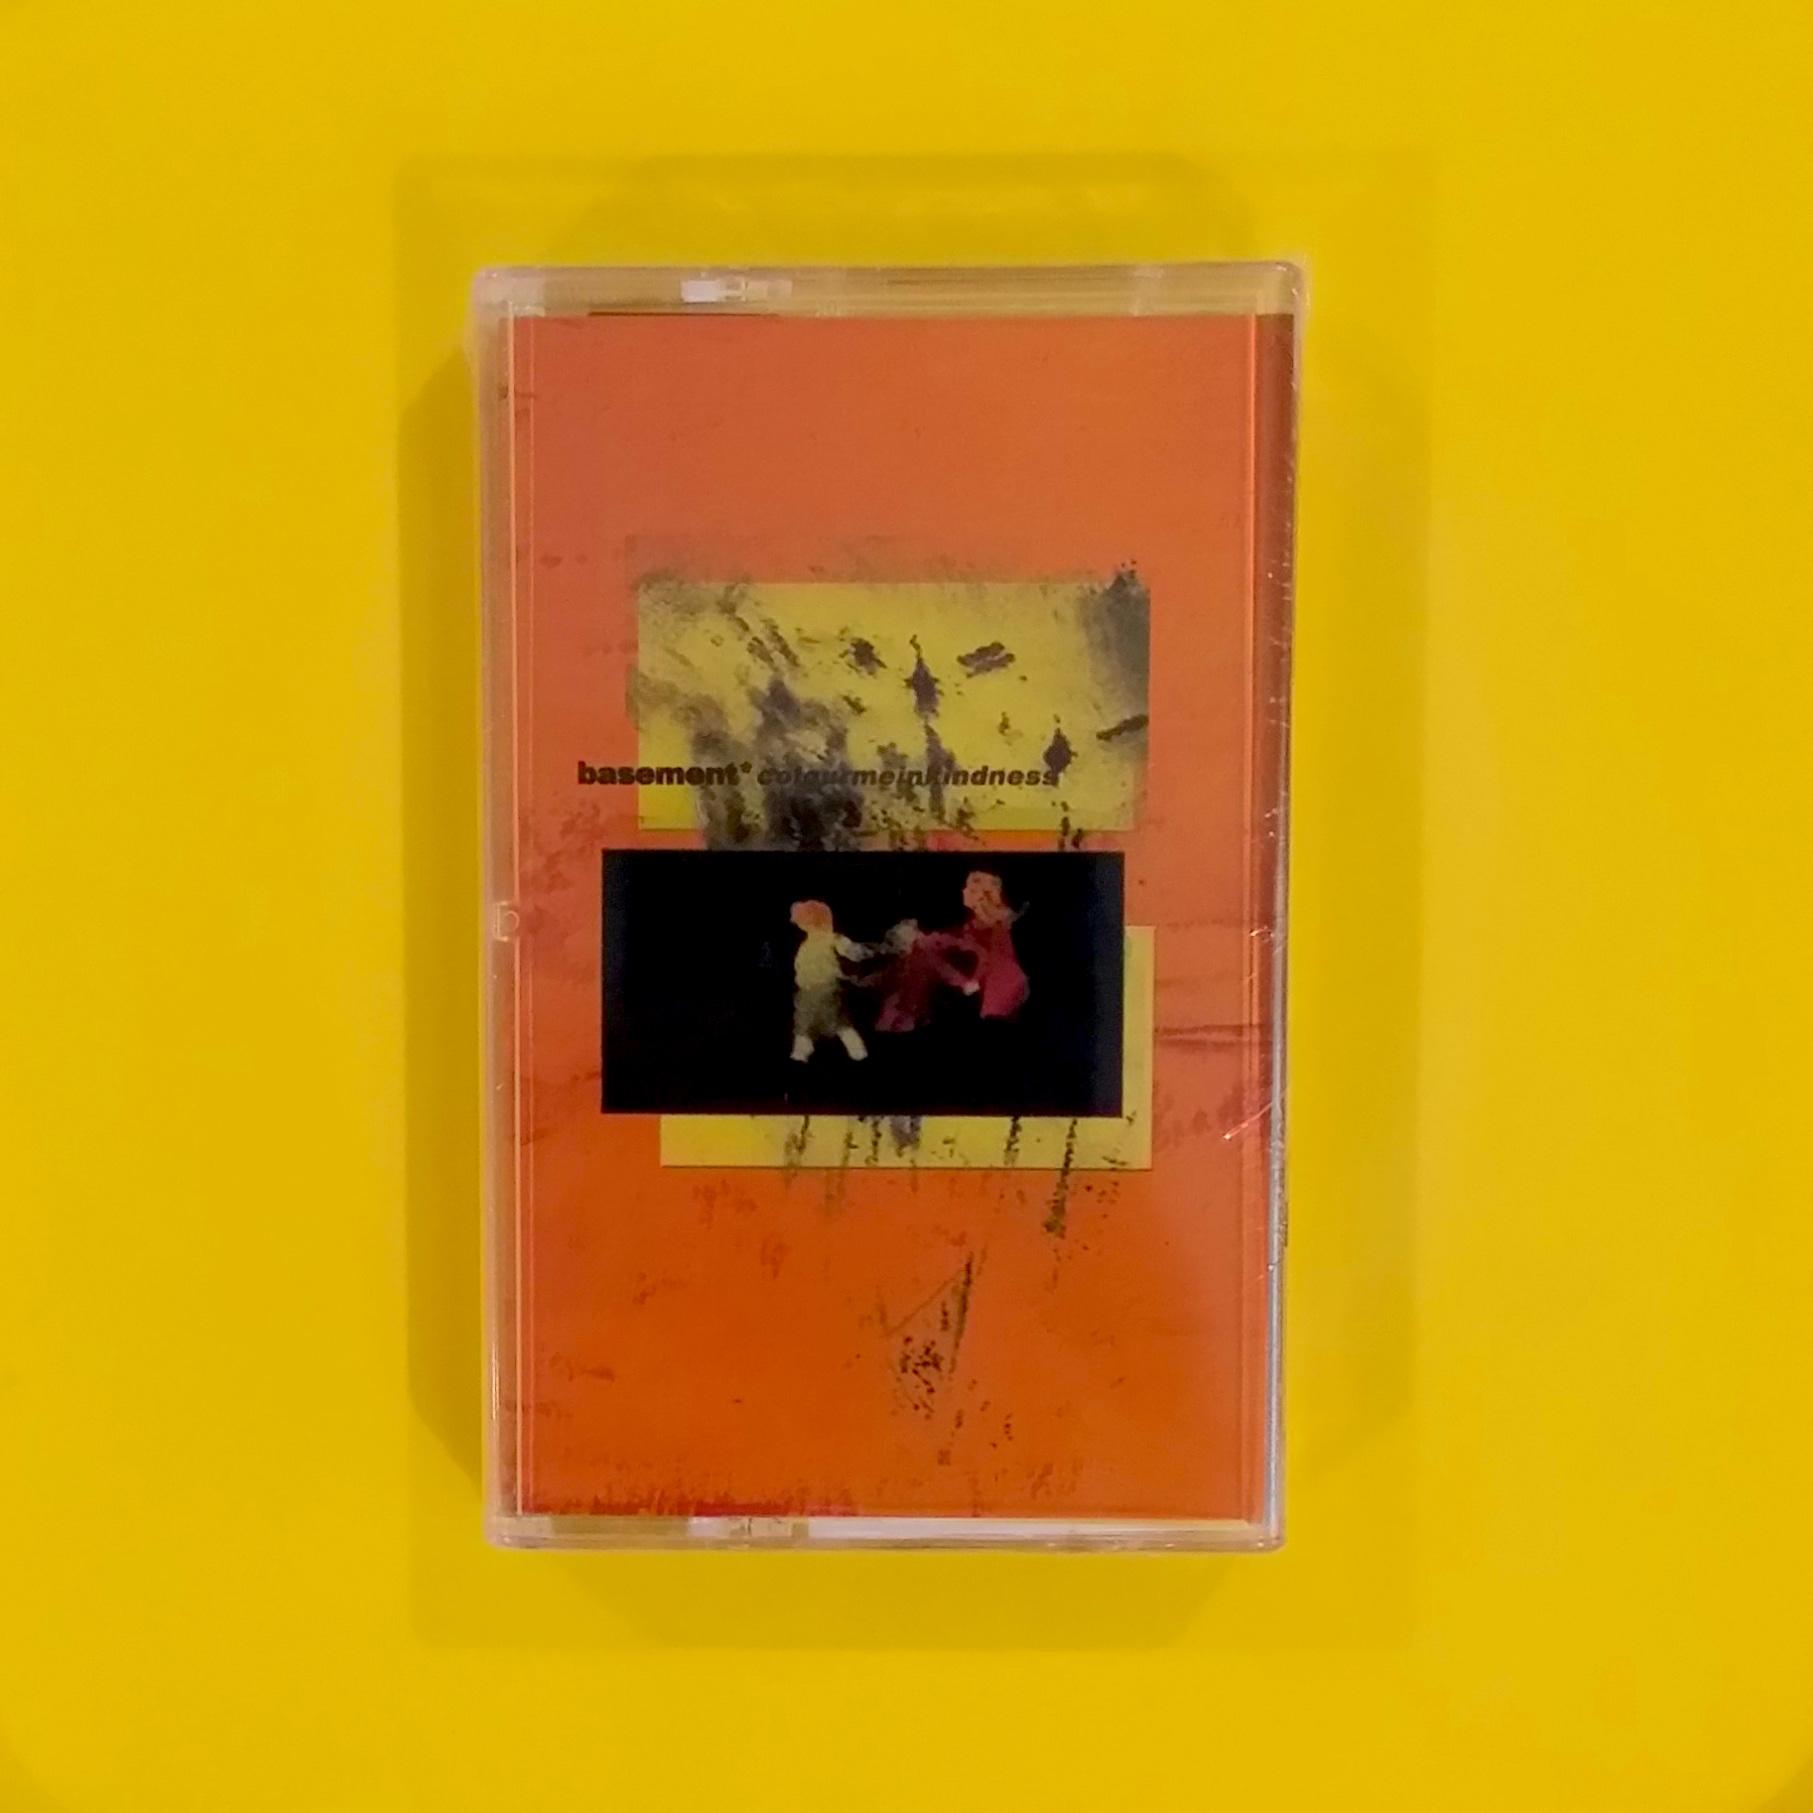 Basement - Colourmeinkindness (Run for Cover Records)